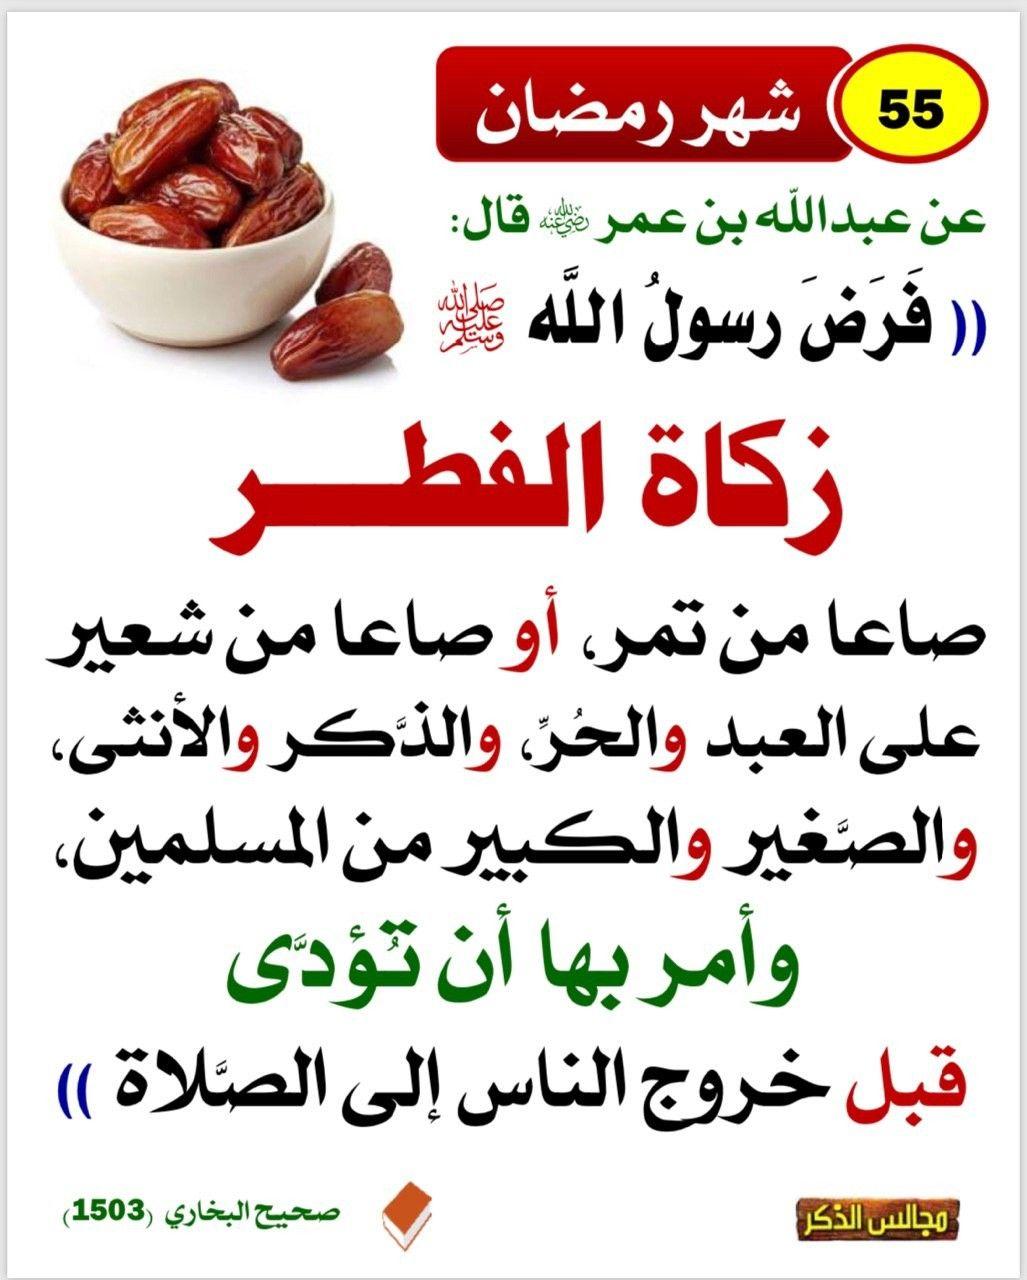 زكاة الفطر Islam Facts Hadith Quotes Ahadith